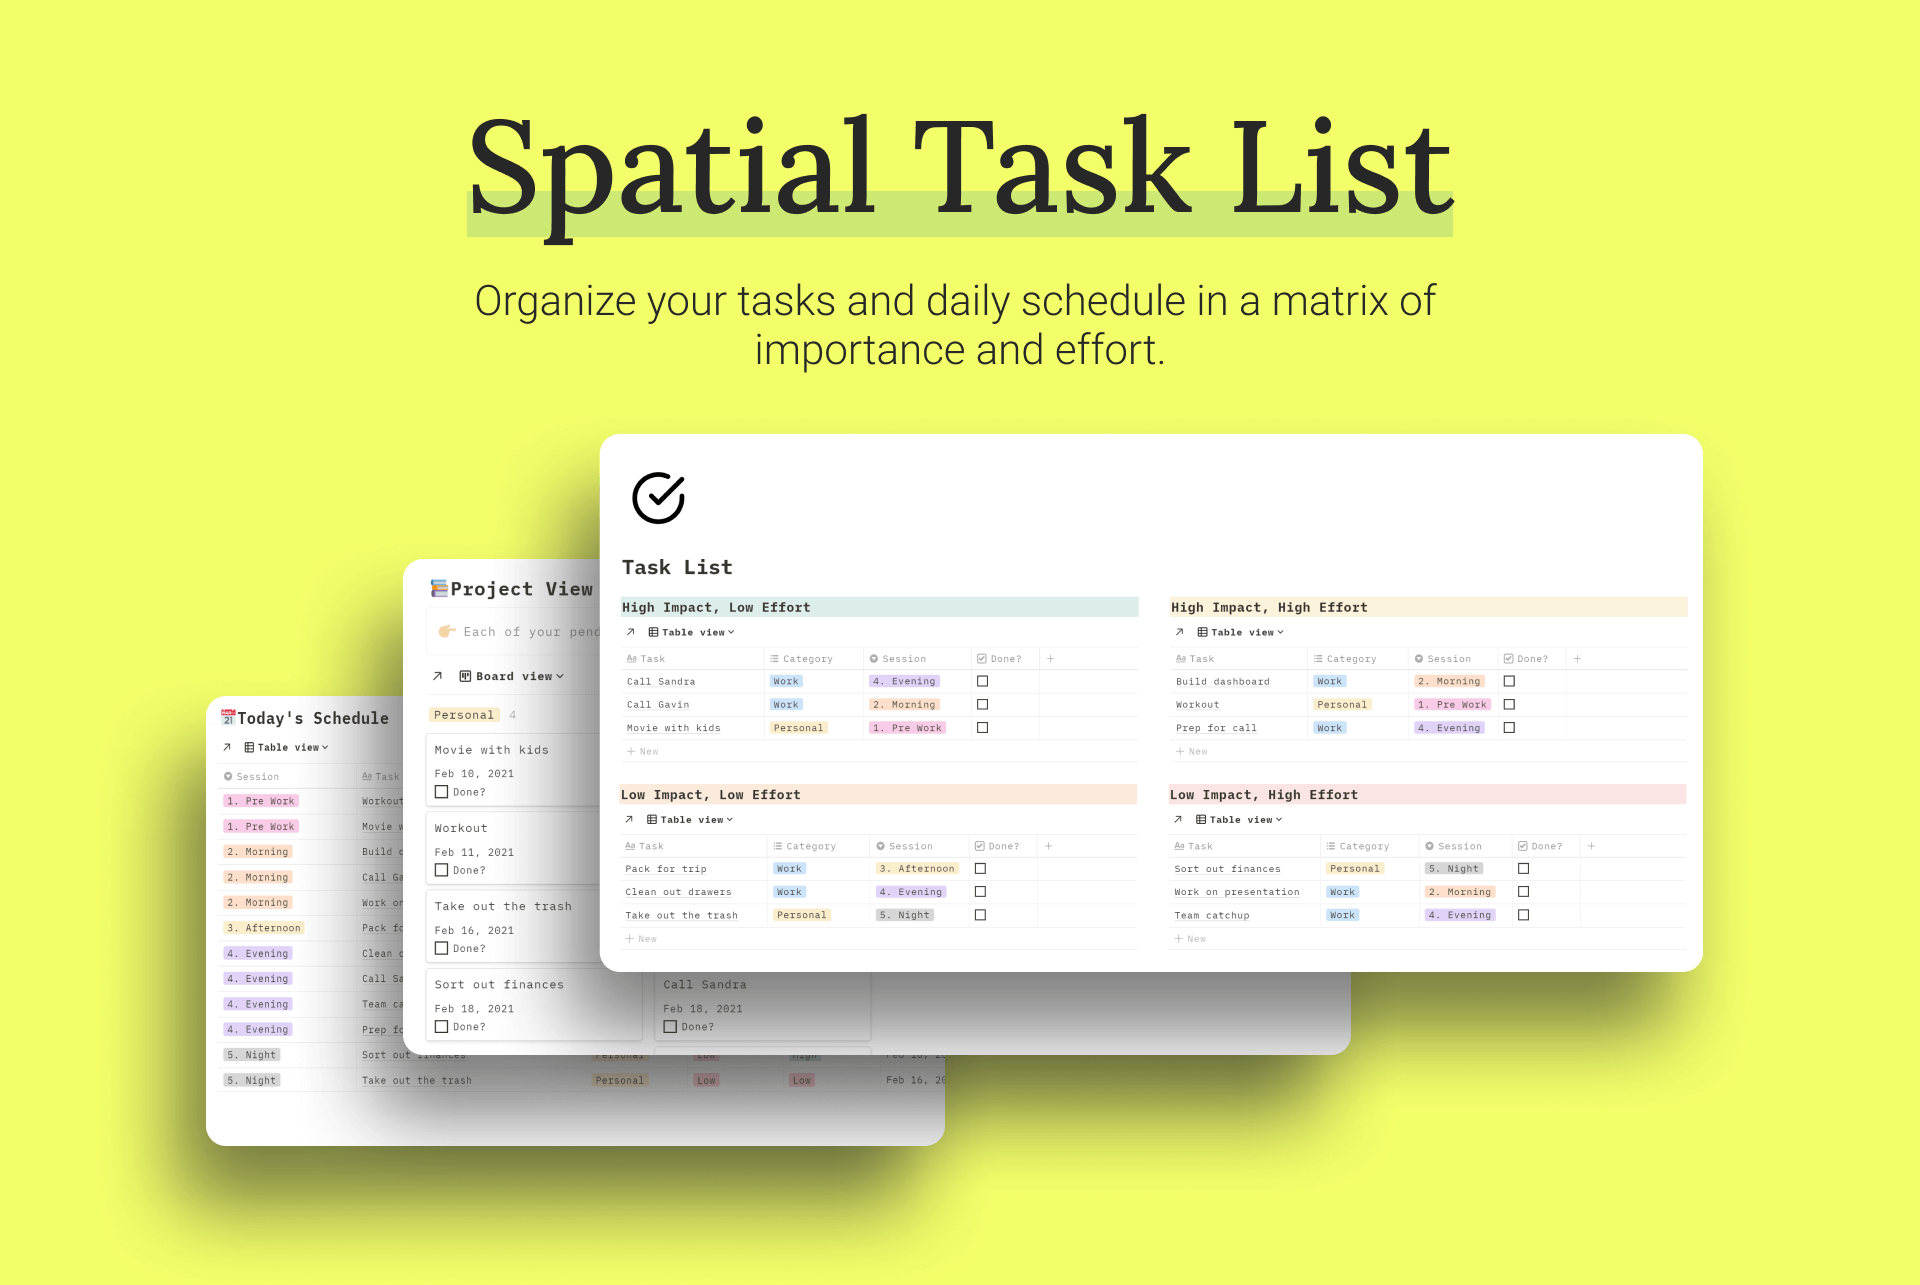 Spatial Task List